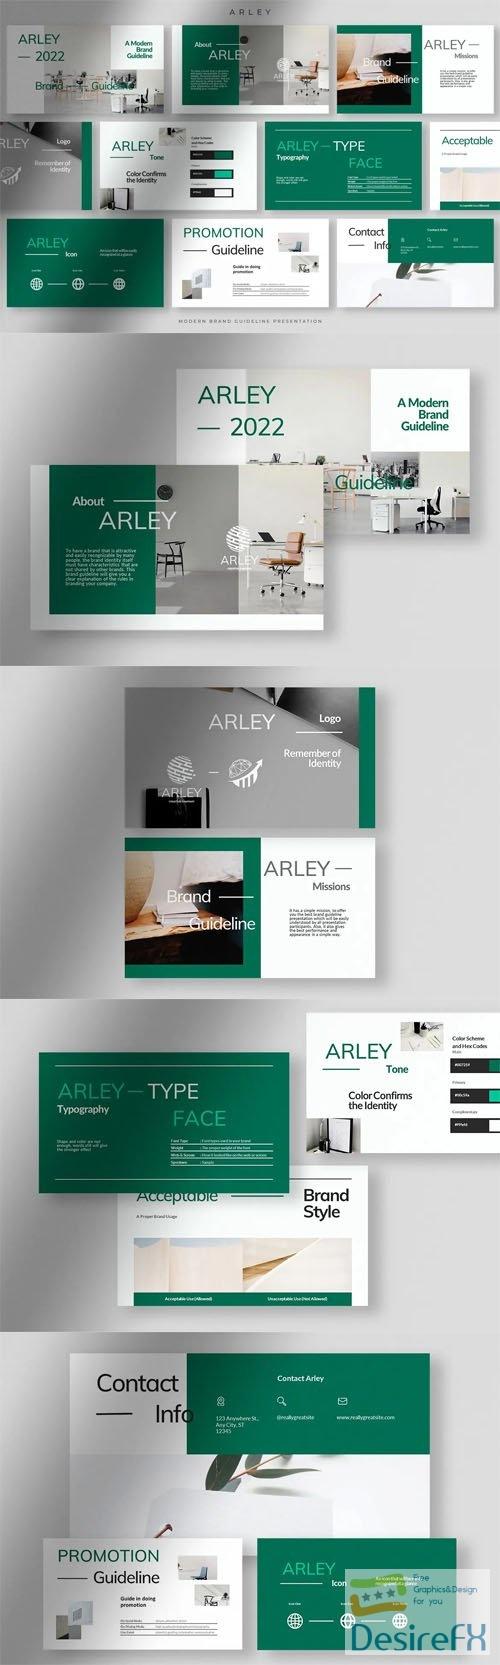 Arley Presentation - Brand Guideline Powerpoint Template